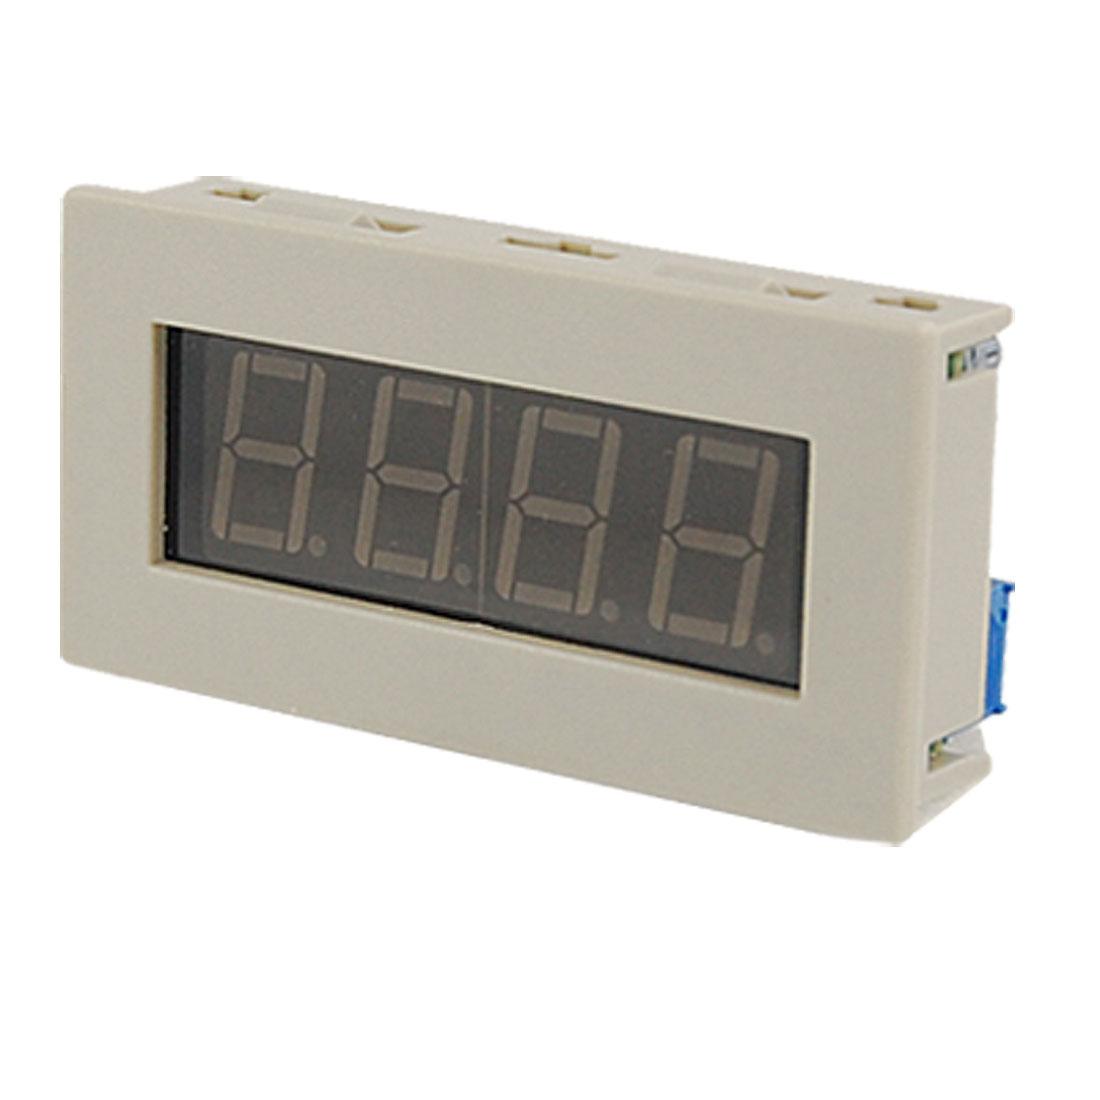 DC 0-199.9mA 3 1/2 Digital Display Amperemeter Panel